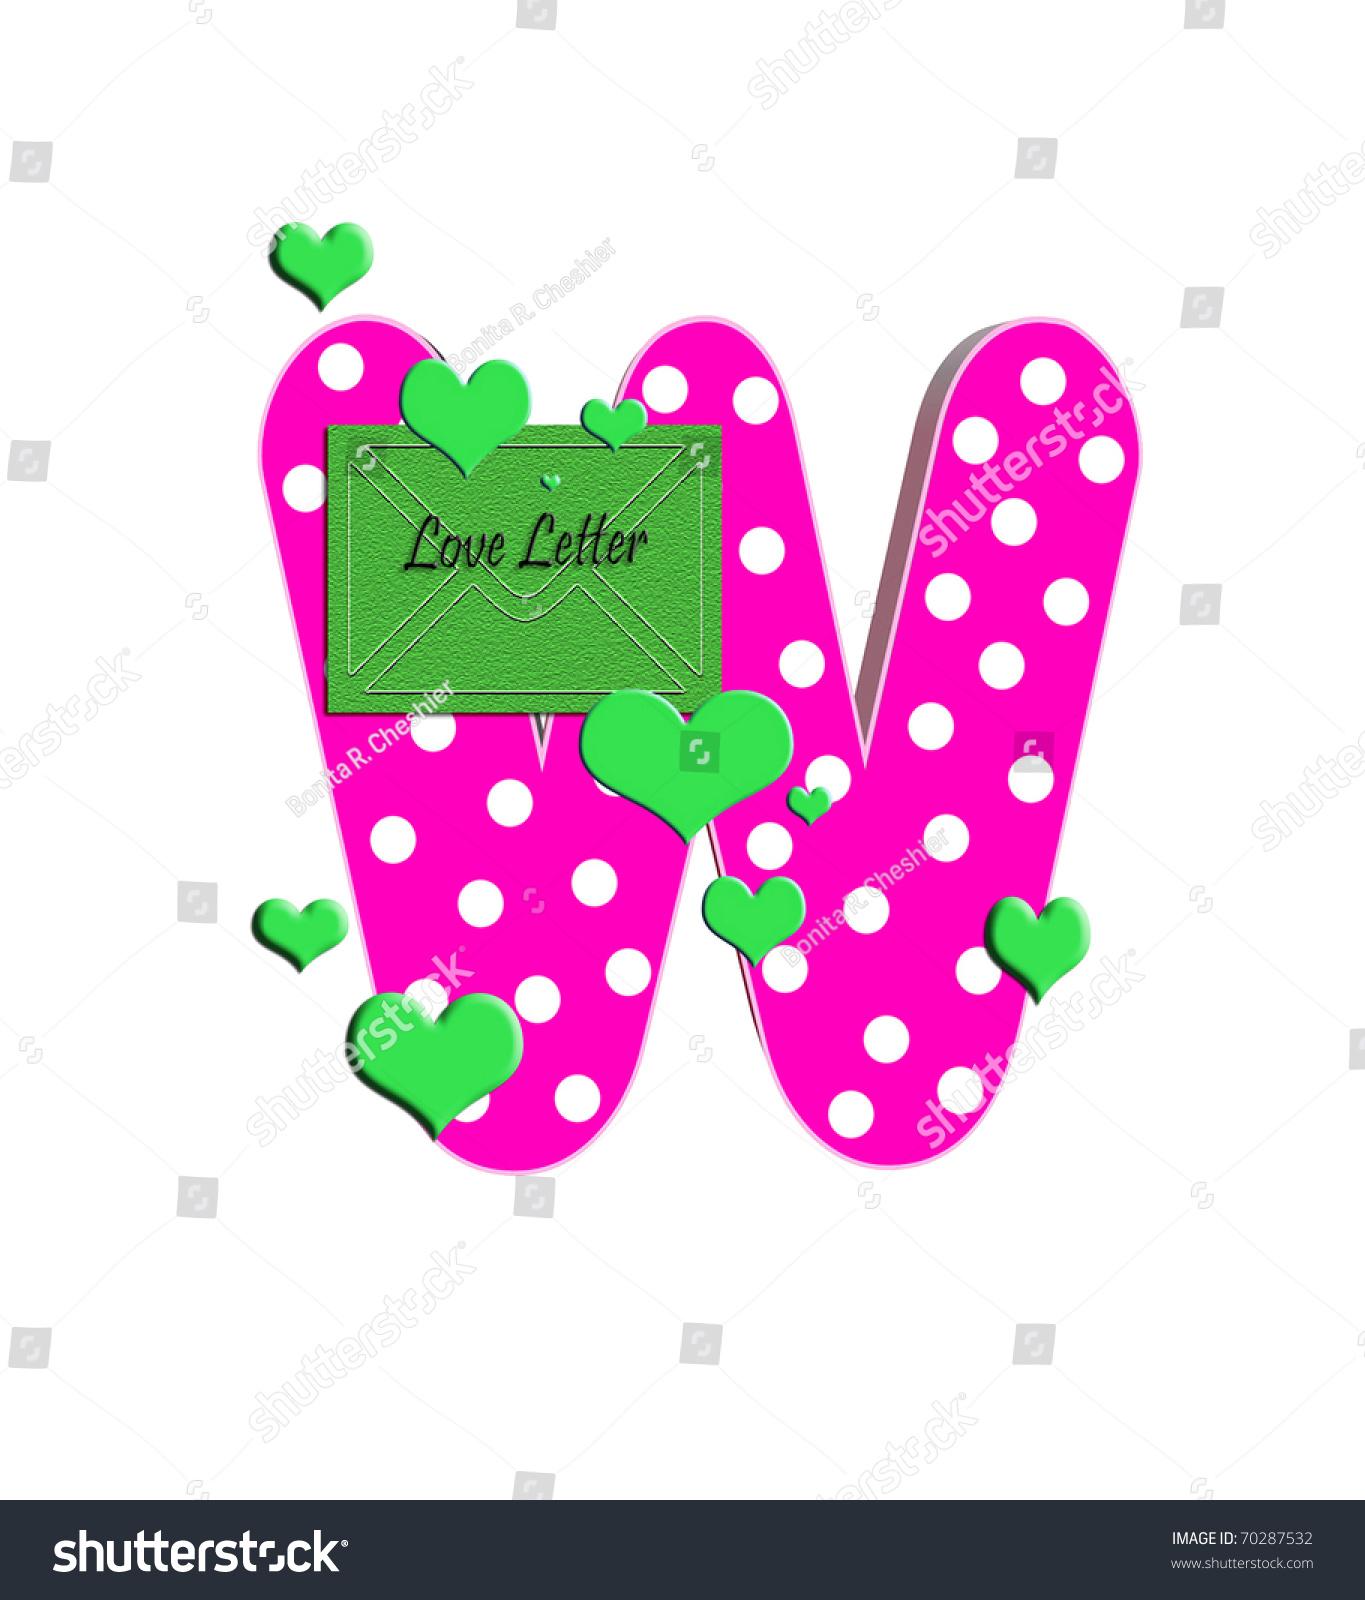 w alphabet set love filled polka stock illustration - royalty free